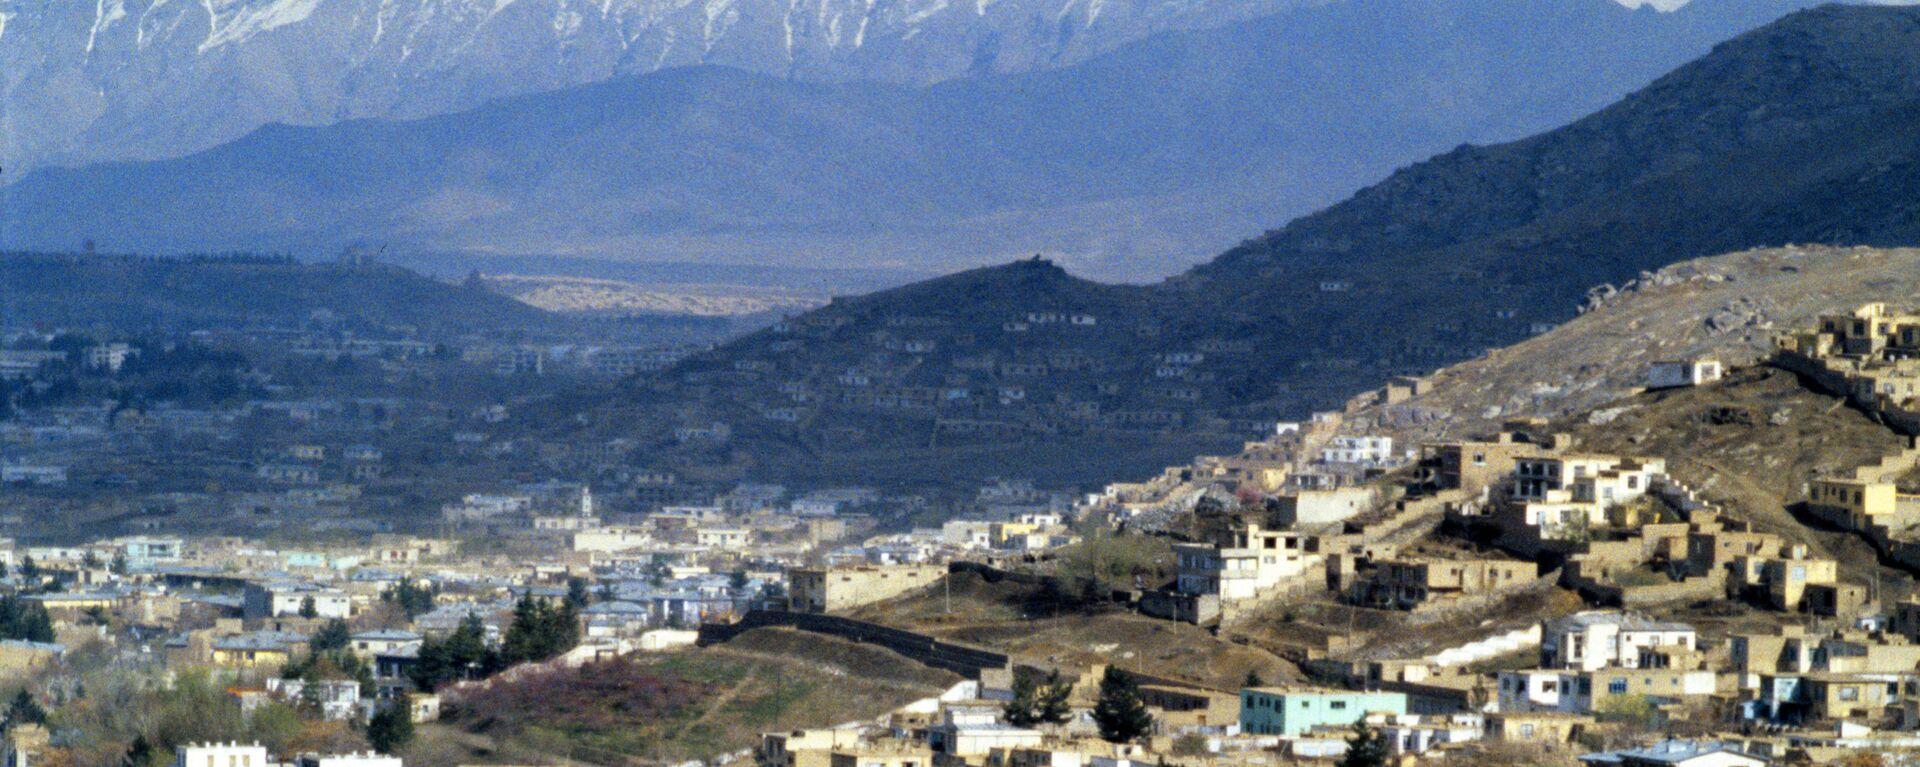 Kabul, capital de Afganistán - Sputnik Mundo, 1920, 18.08.2021